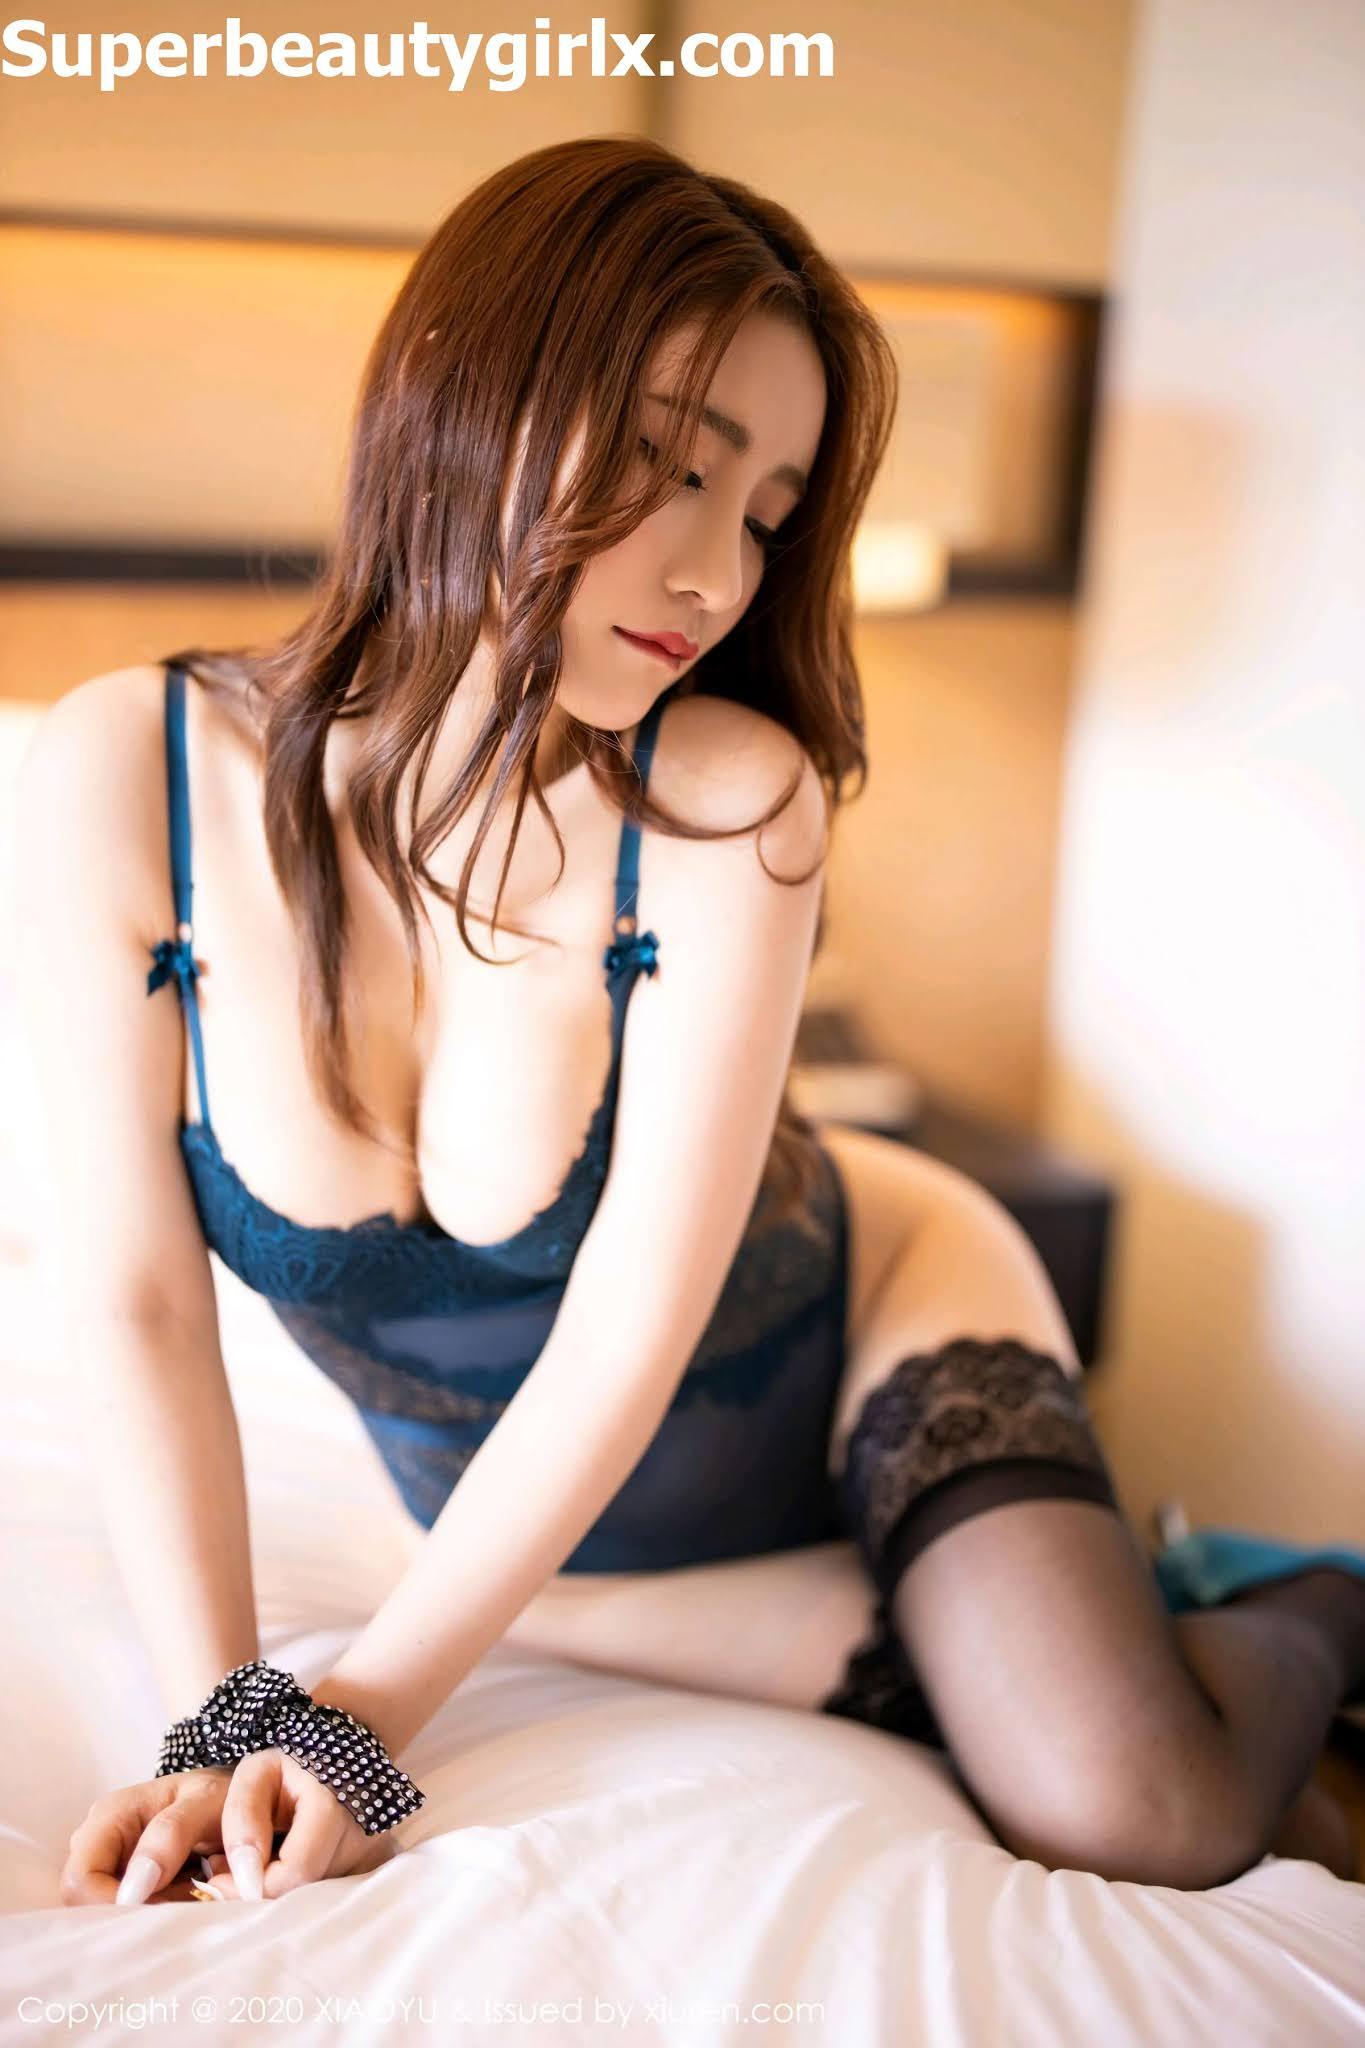 XiaoYu-Vol.371-Cherry-Superbeautygirlx.com